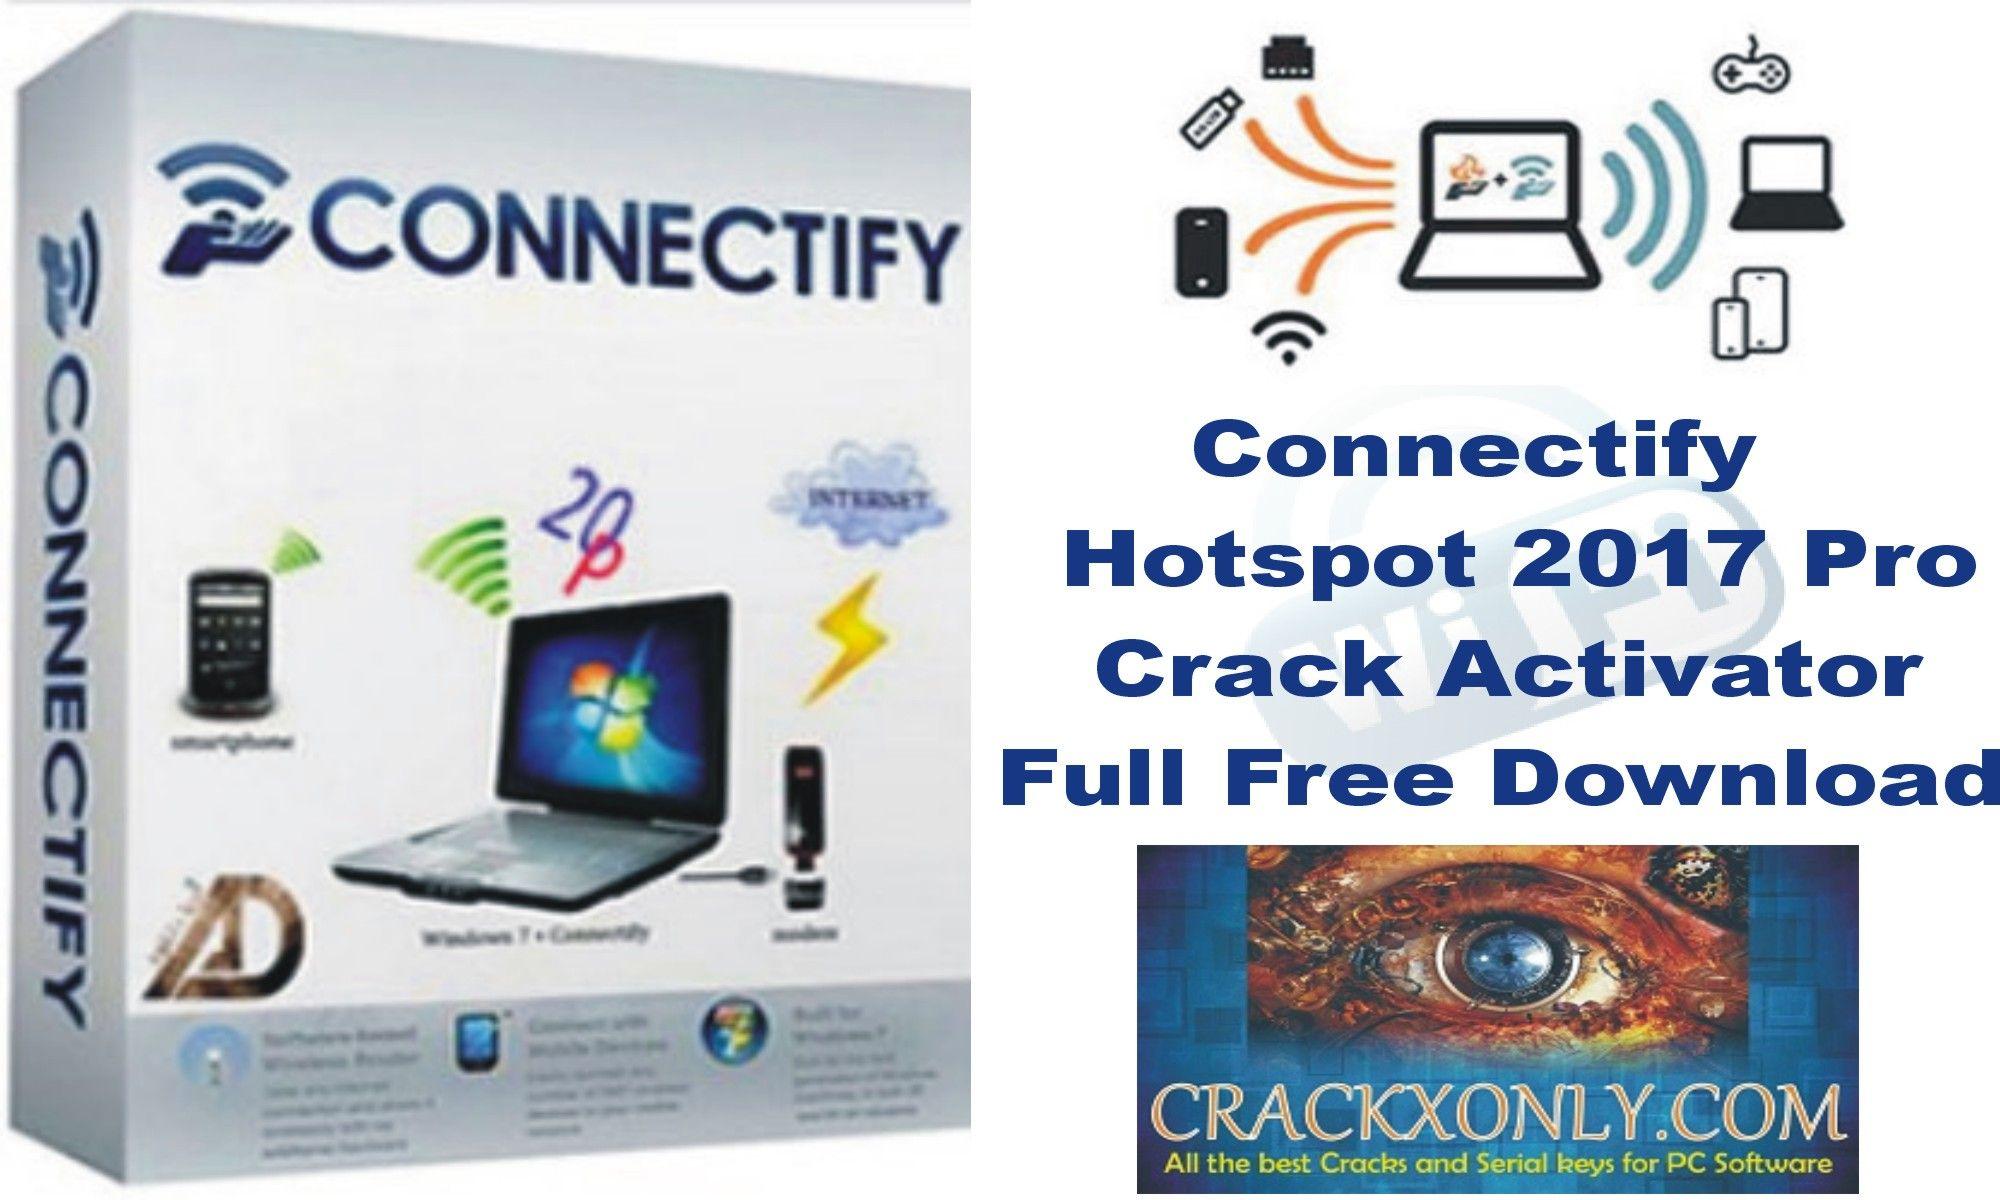 Download manycam enterprise 5 0 5 2 multilingual - Connectify Hotspot 2017 Pro Crack Activator Full Free Download Connectify Hotspot 2017 Pro Crack